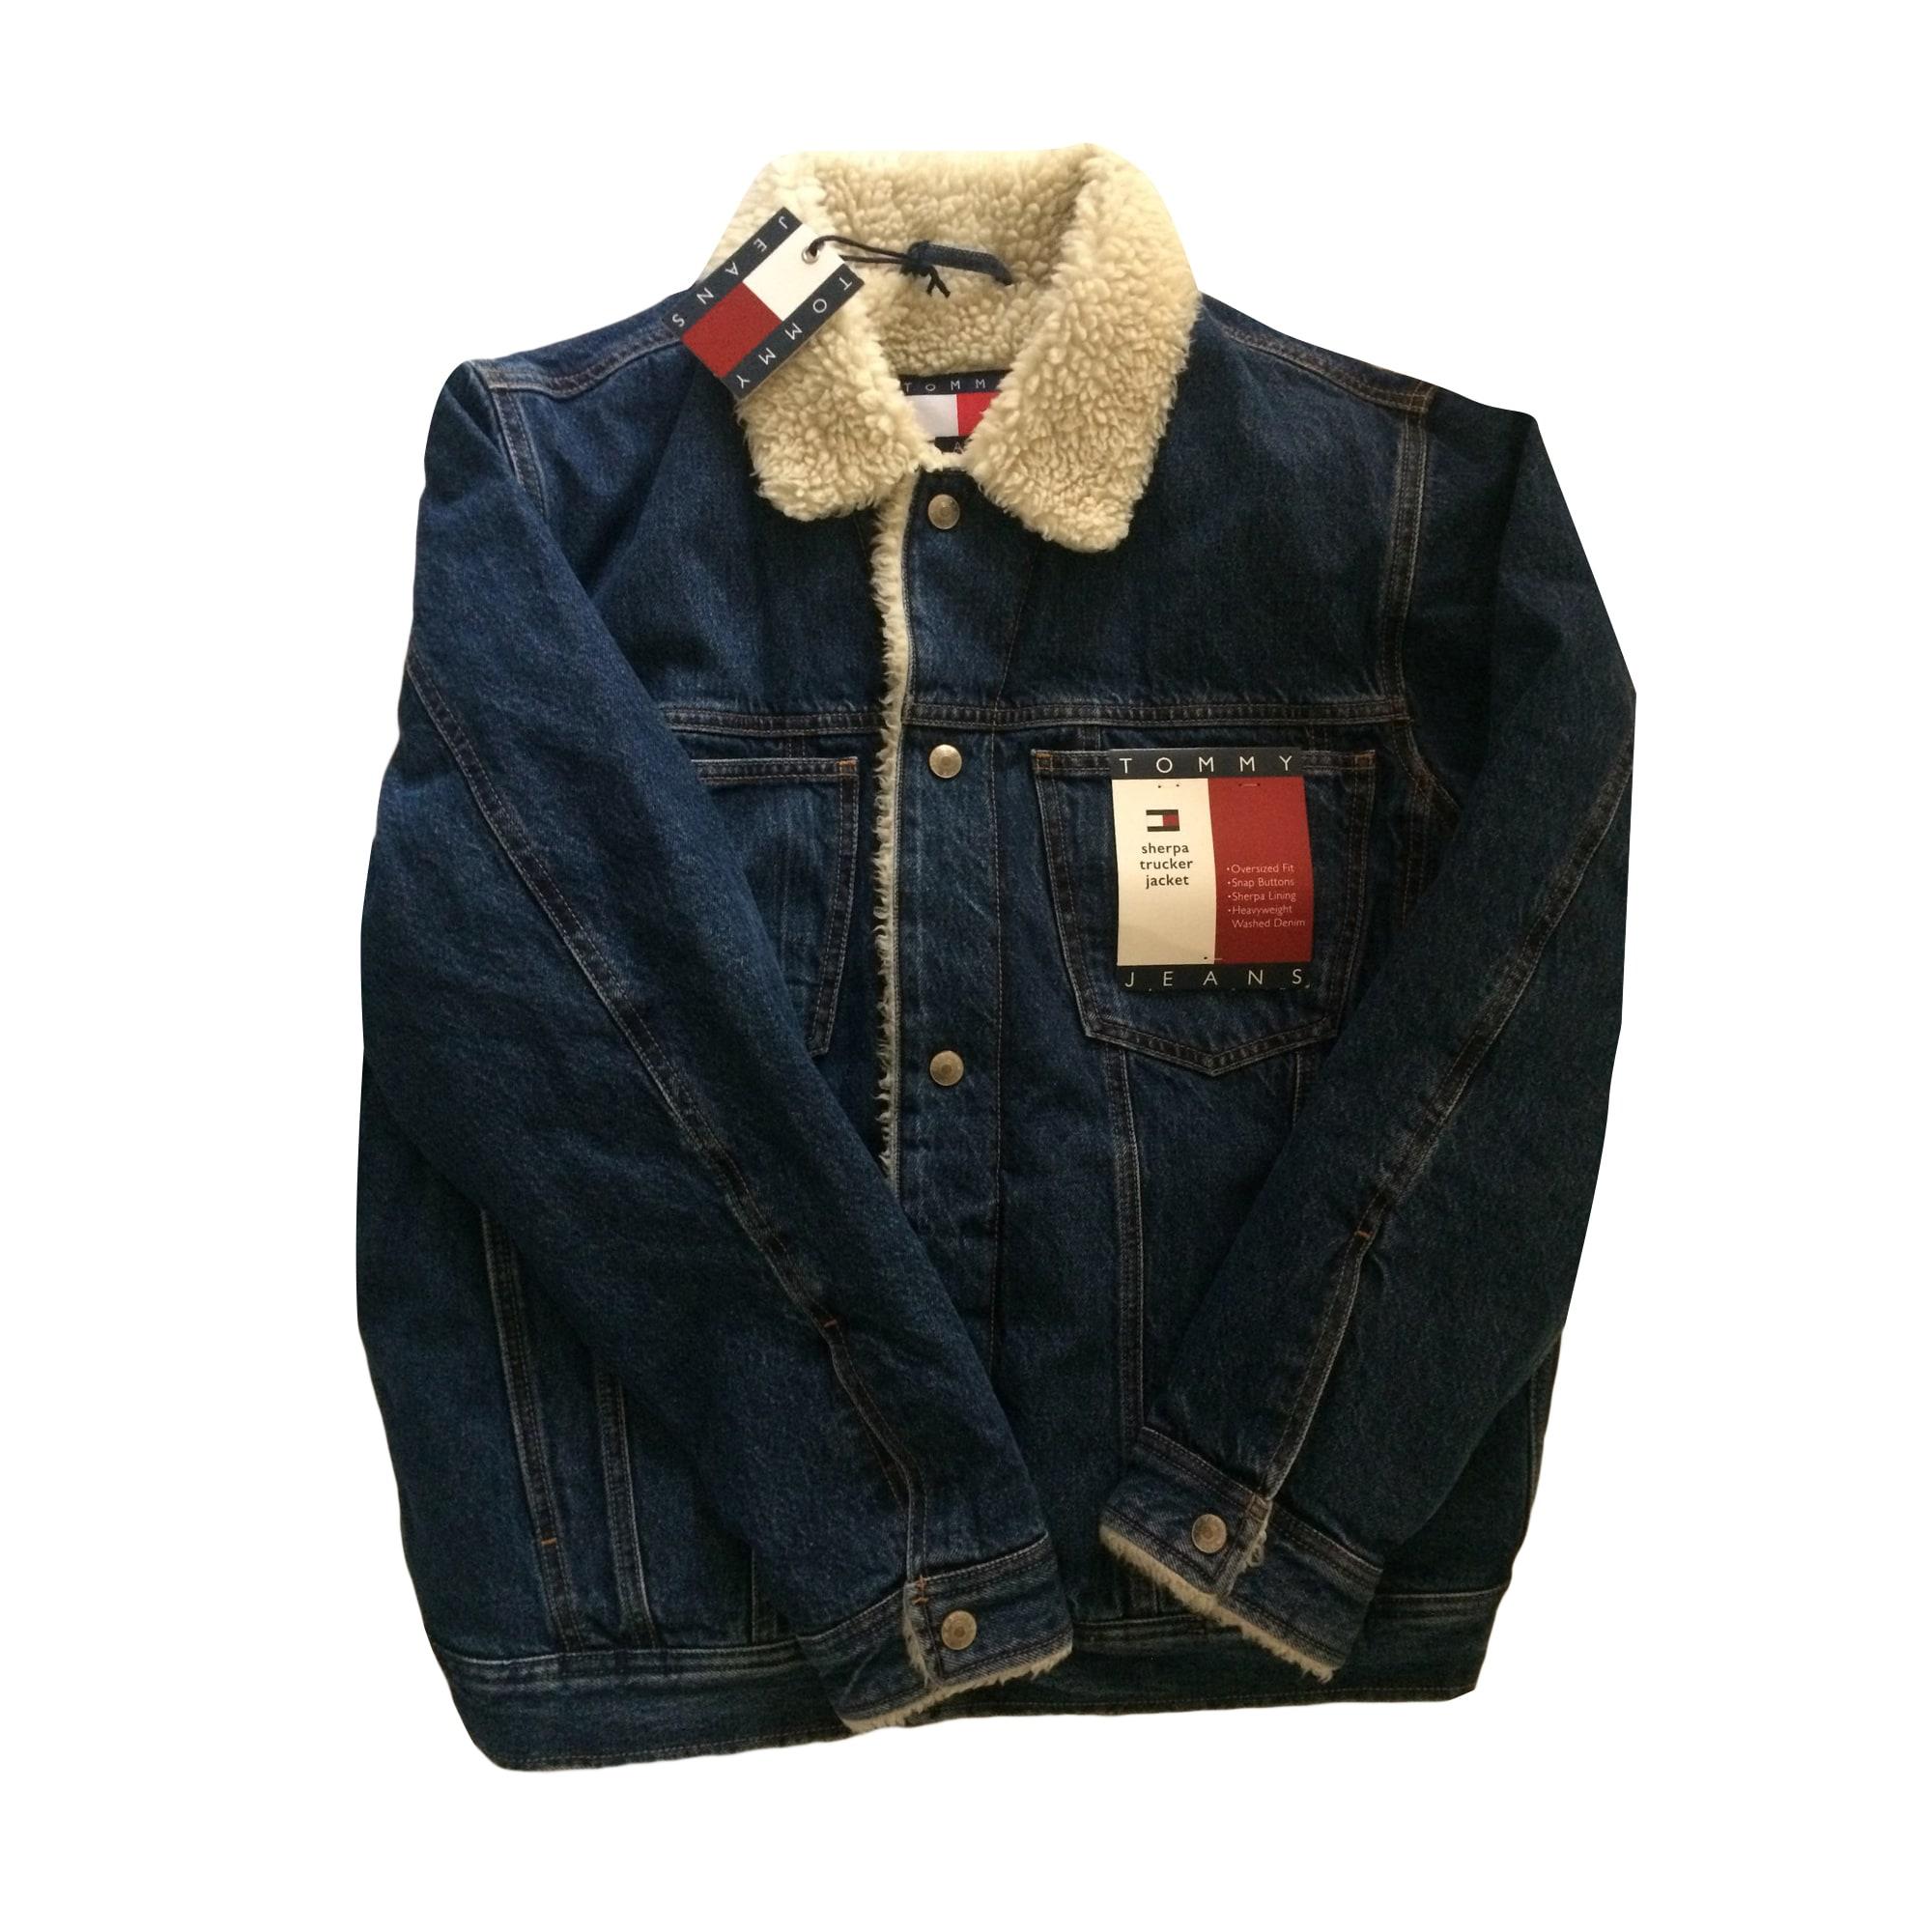 ad871f84cb98 Blouson en jean TOMMY HILFIGER 40 (L